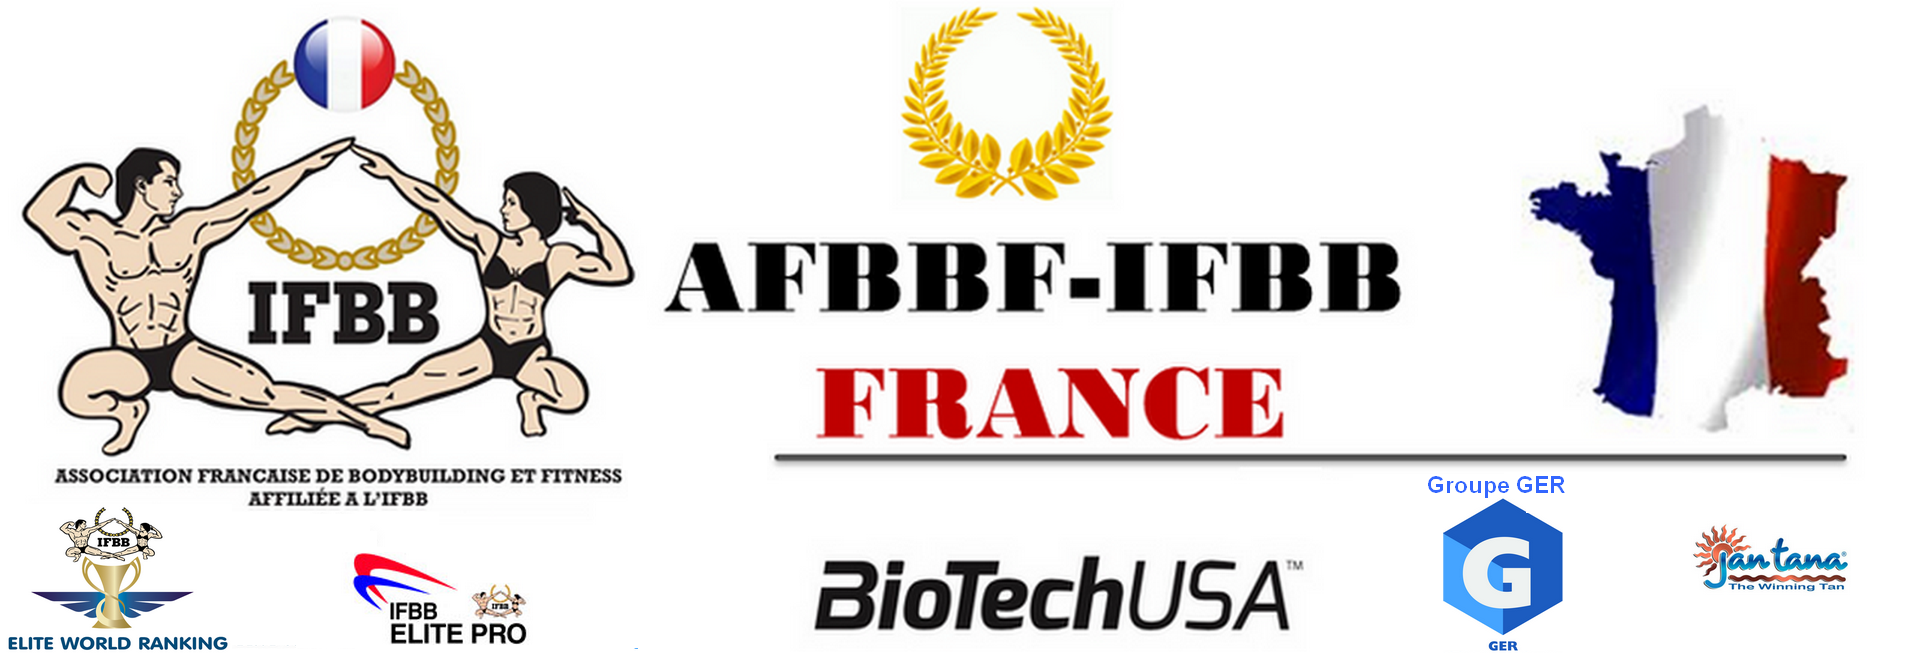 Banniere avec biotech 4